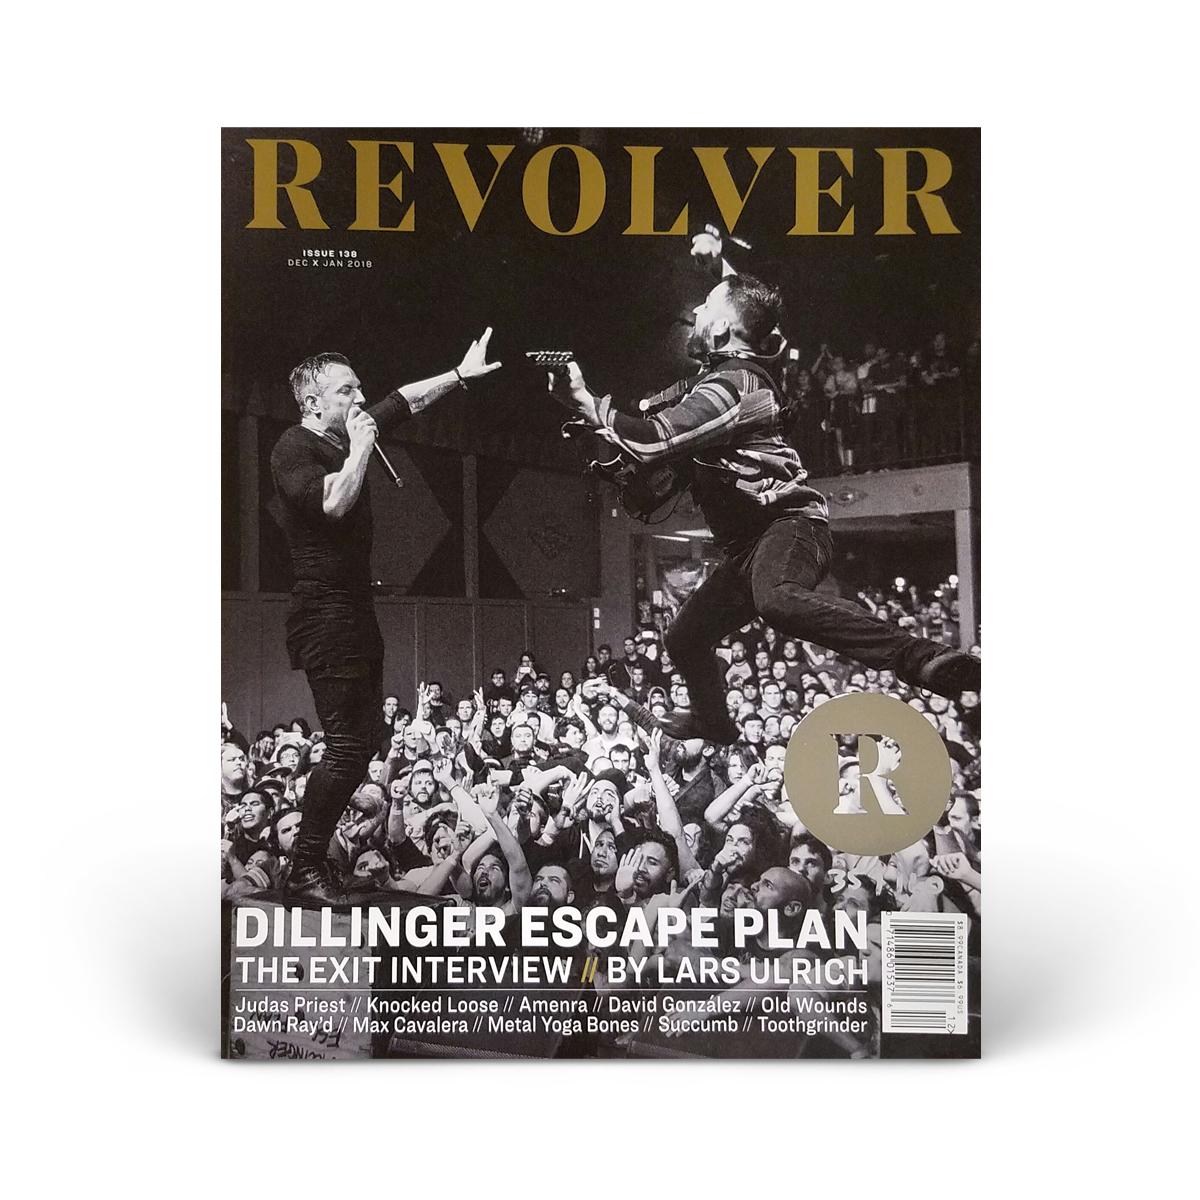 SILVER Collector's Edition Dec/Jan 2018 Issue - Dillinger Escape Plan